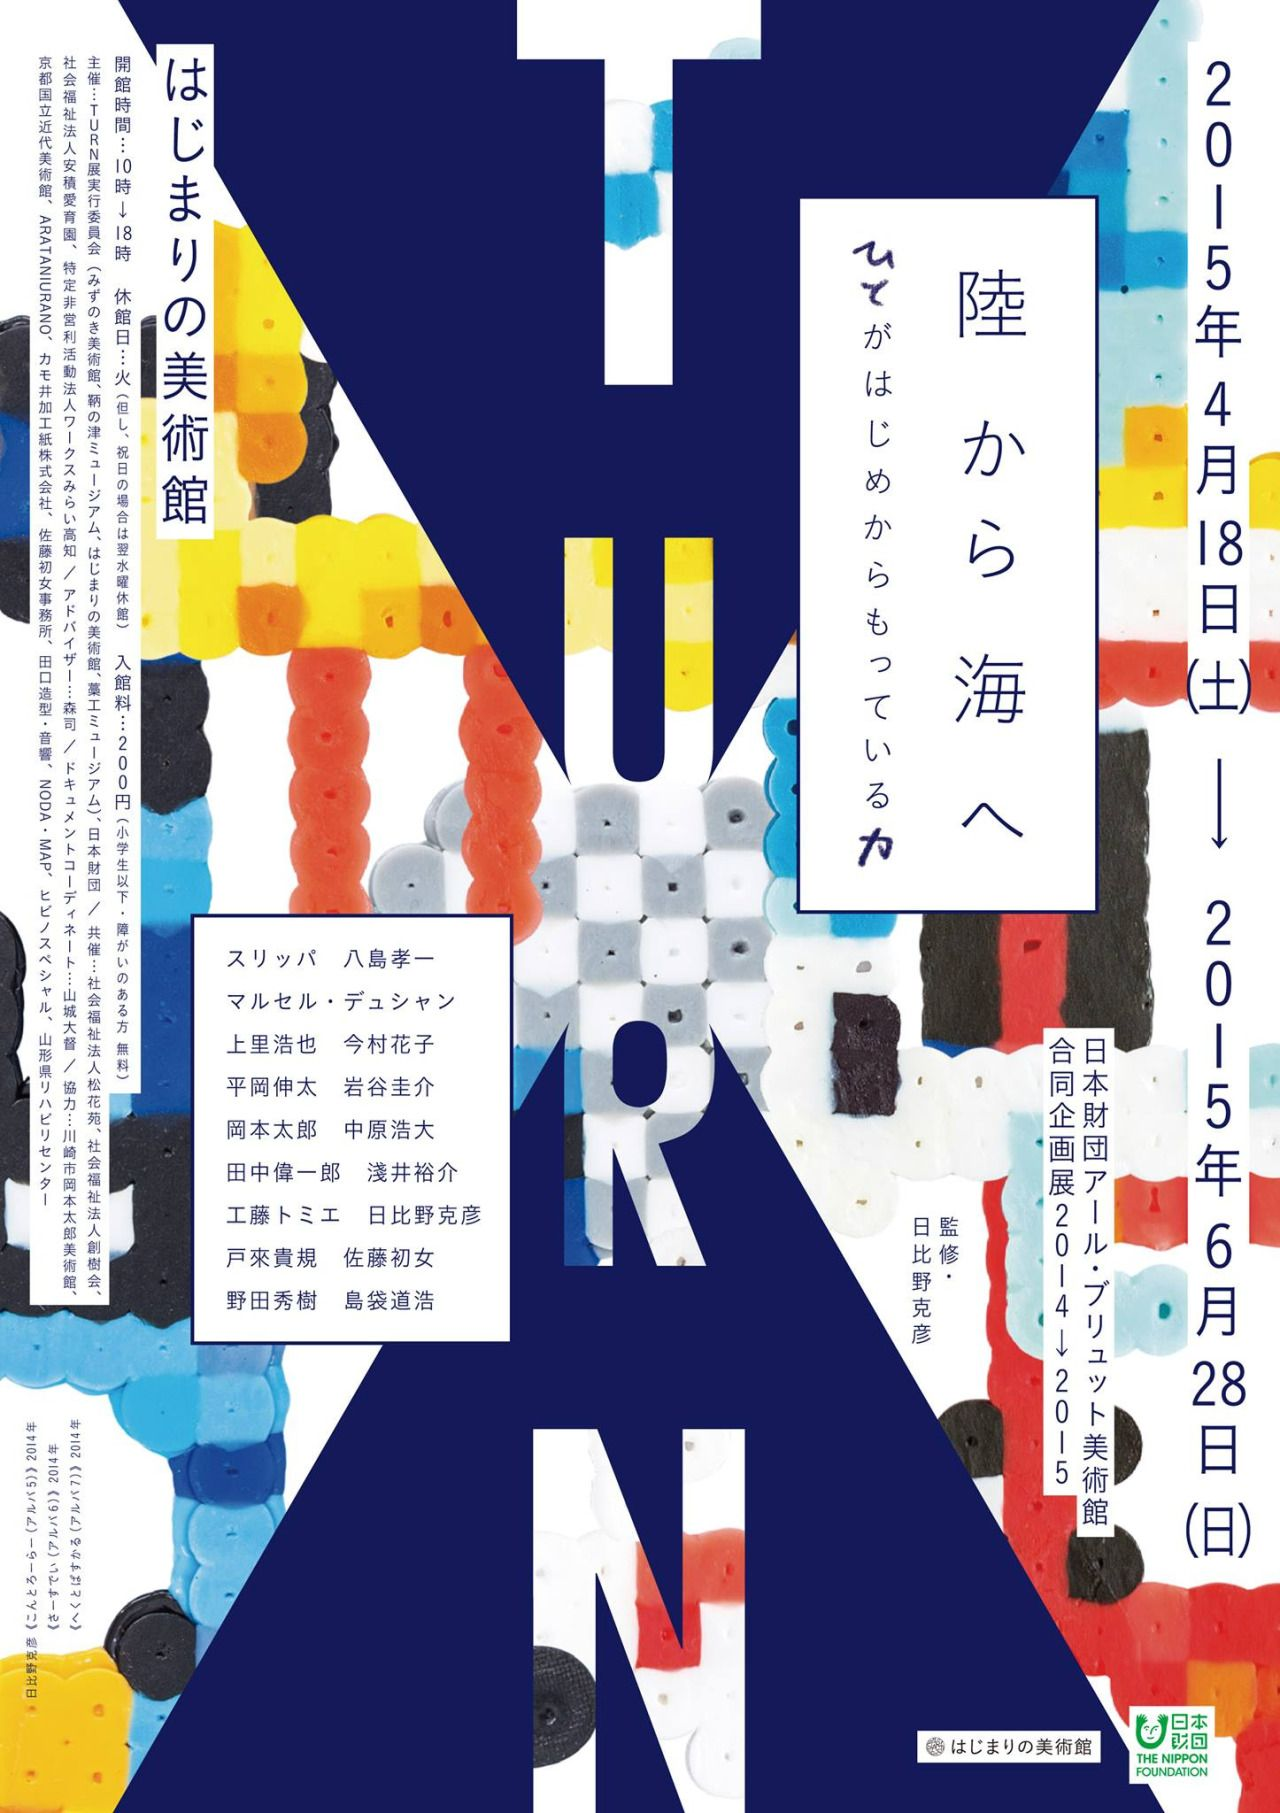 Japanese Exhibition Poster: Turn: Land from the... | Gurafiku: Japanese Graphic Design